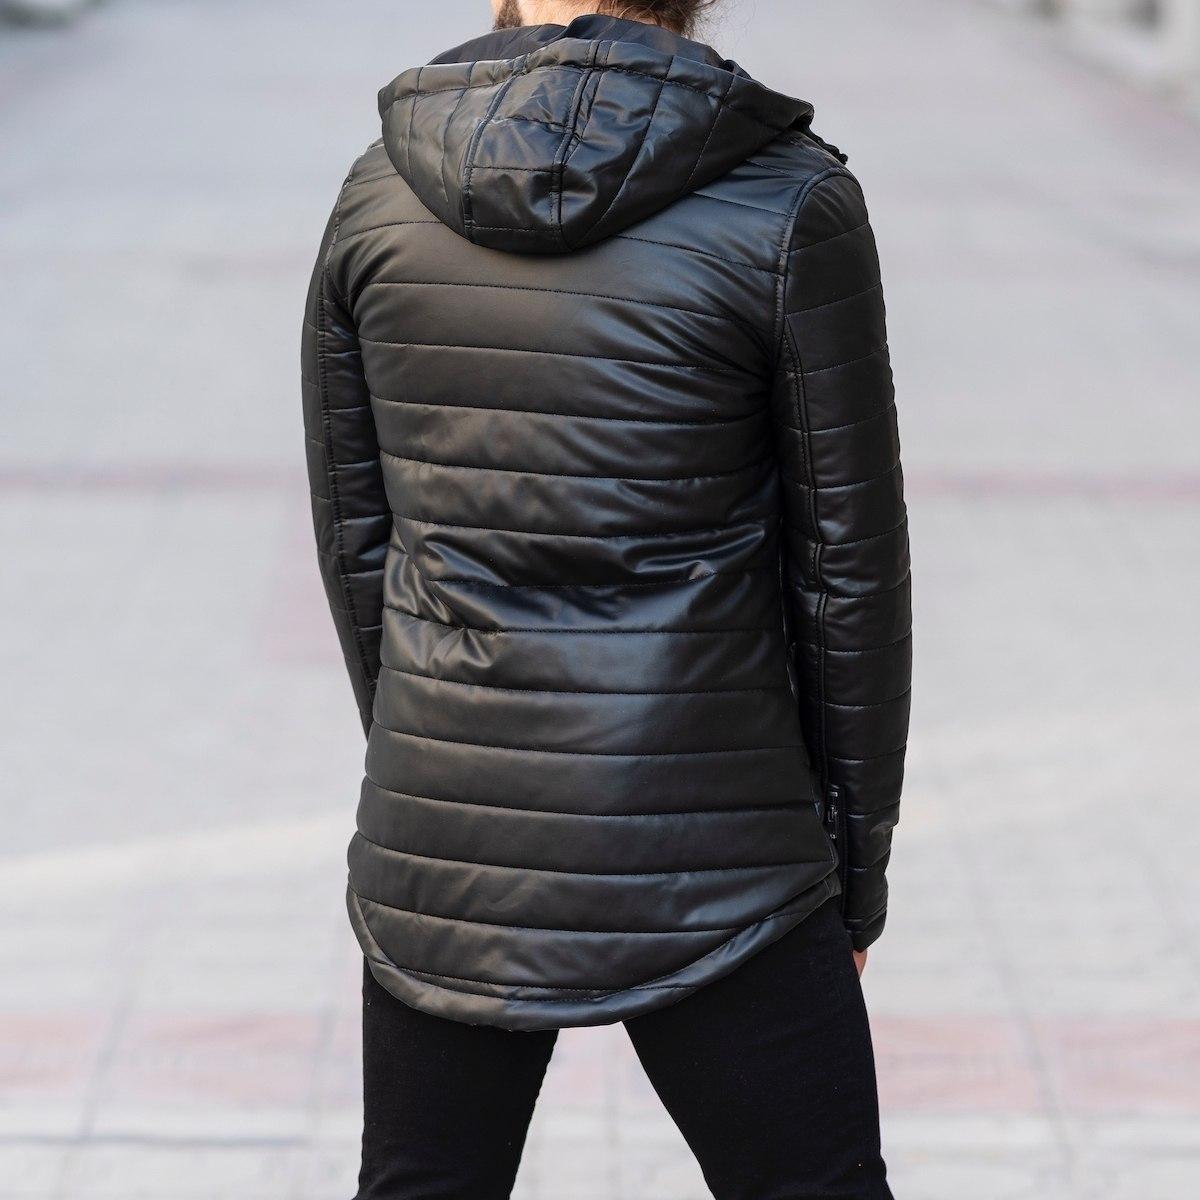 Hooded Long Jacket MV Jacket Collection - 4